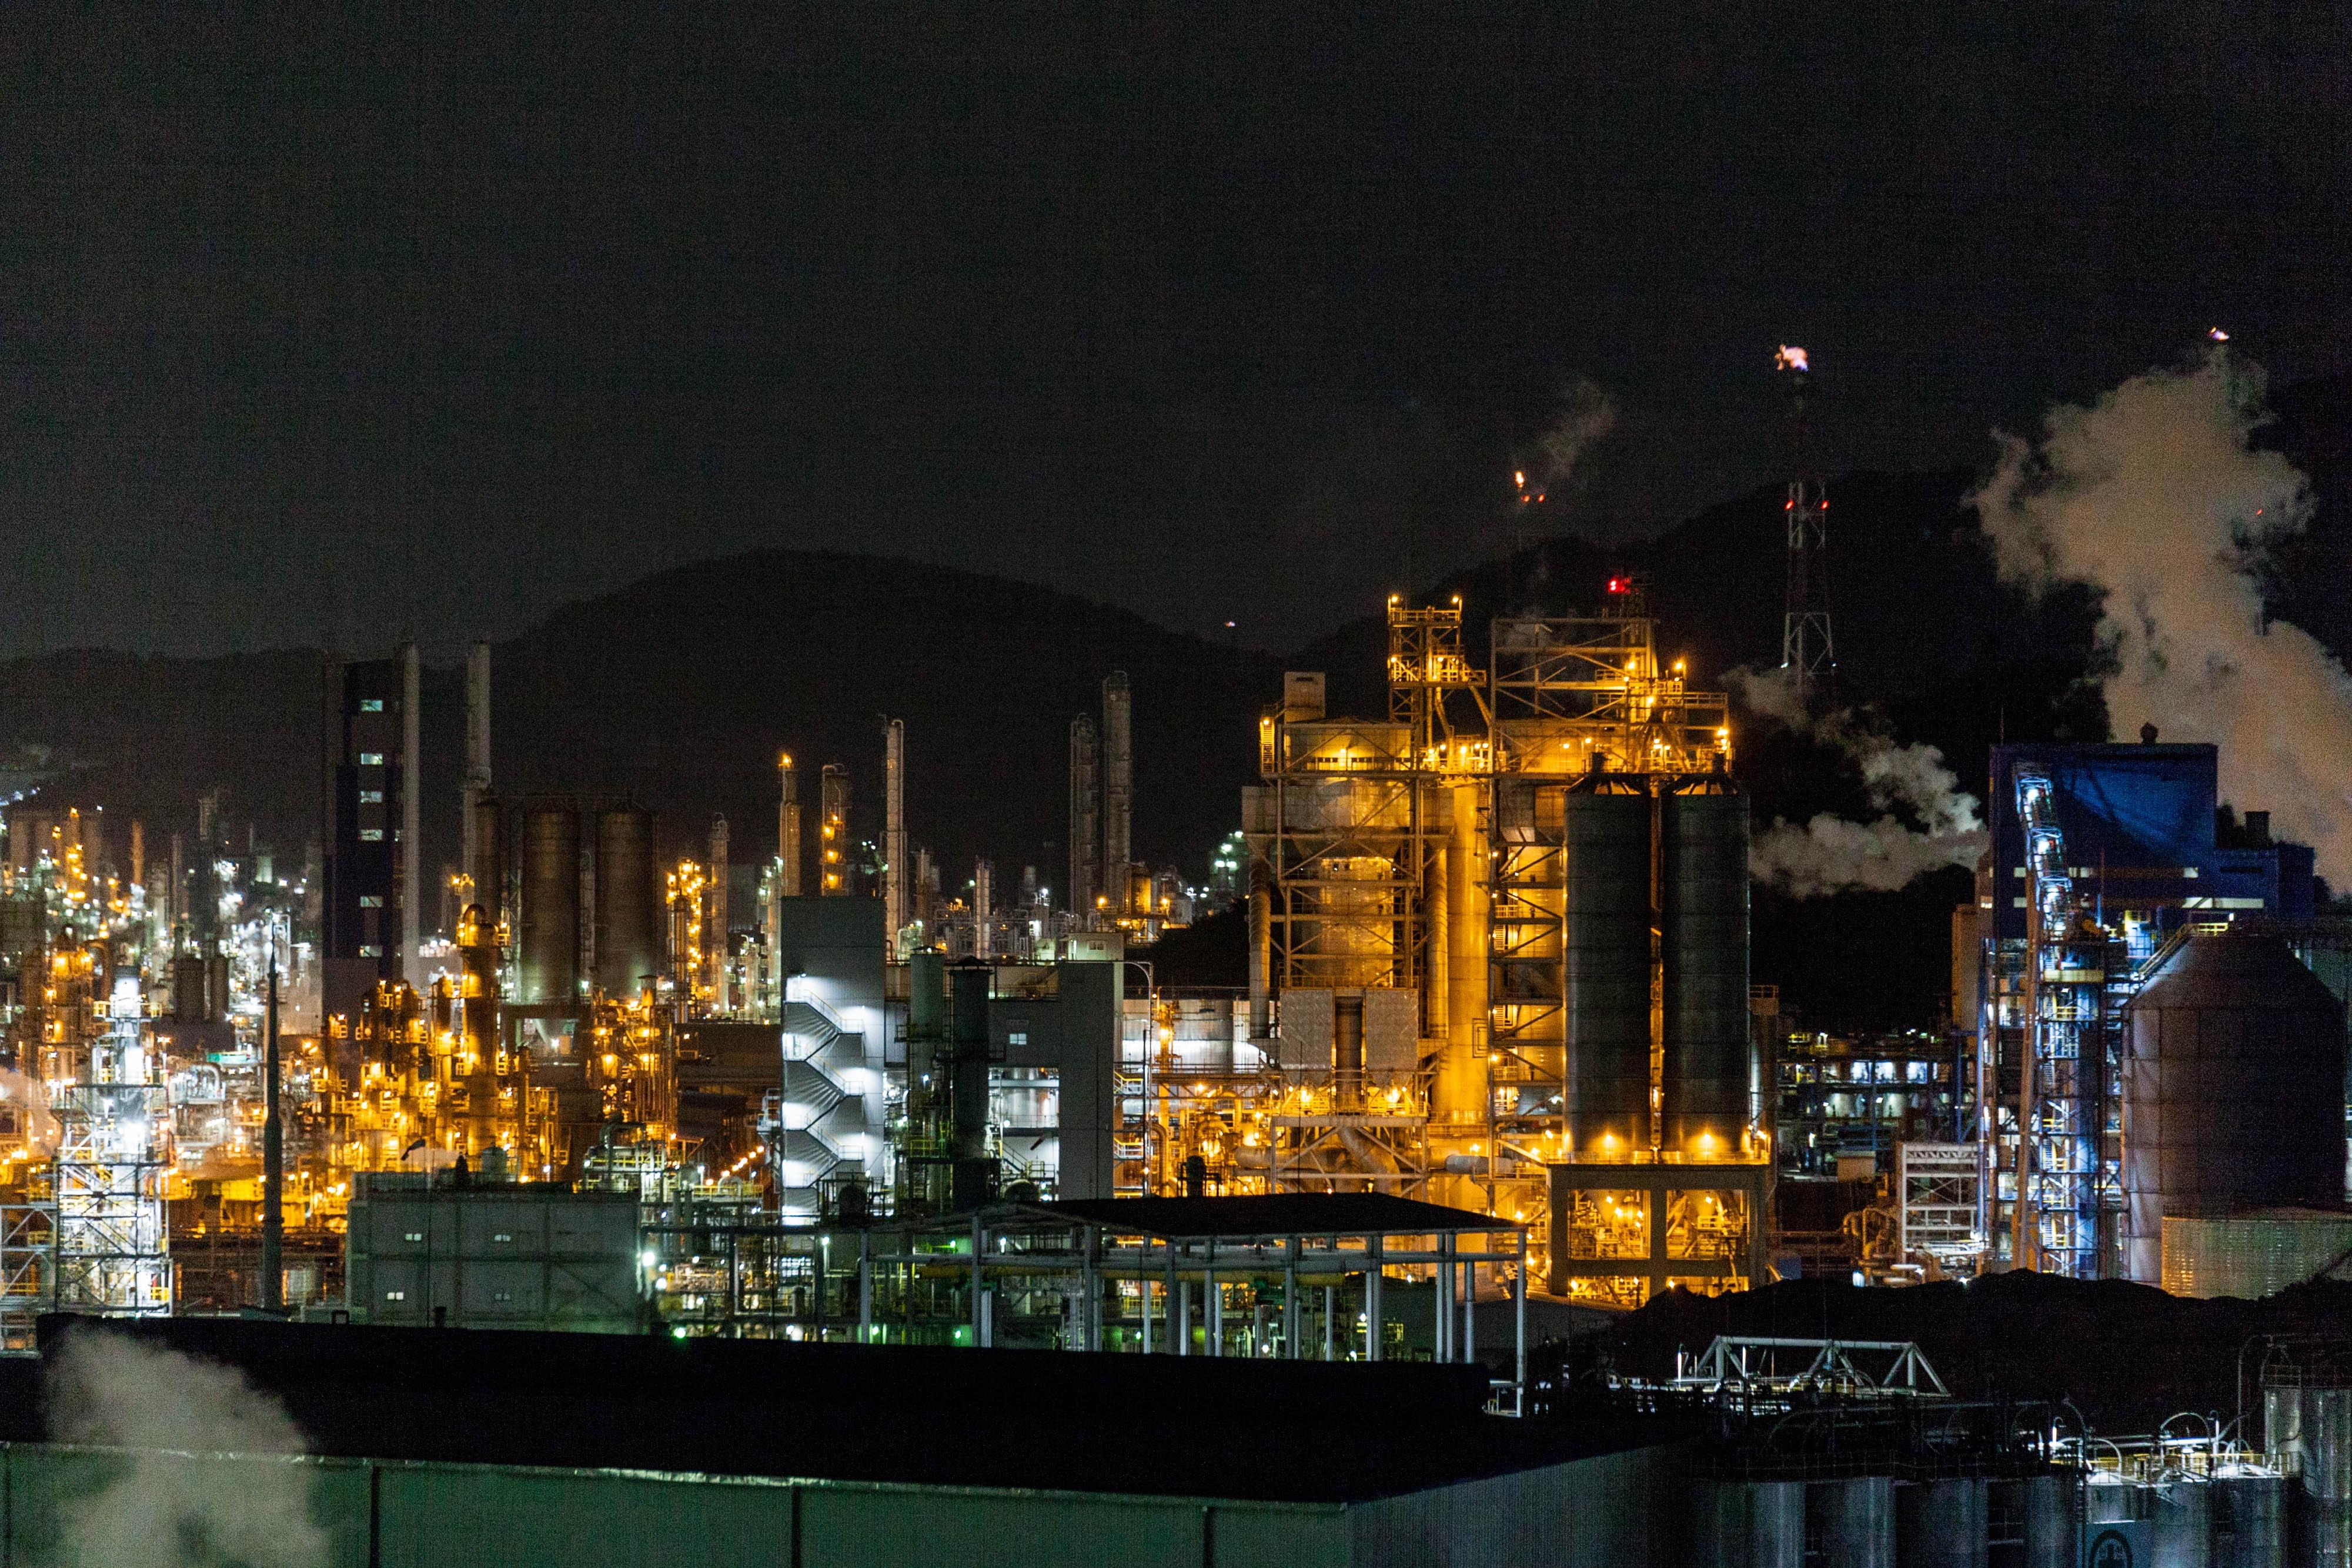 The FDIC Refinery